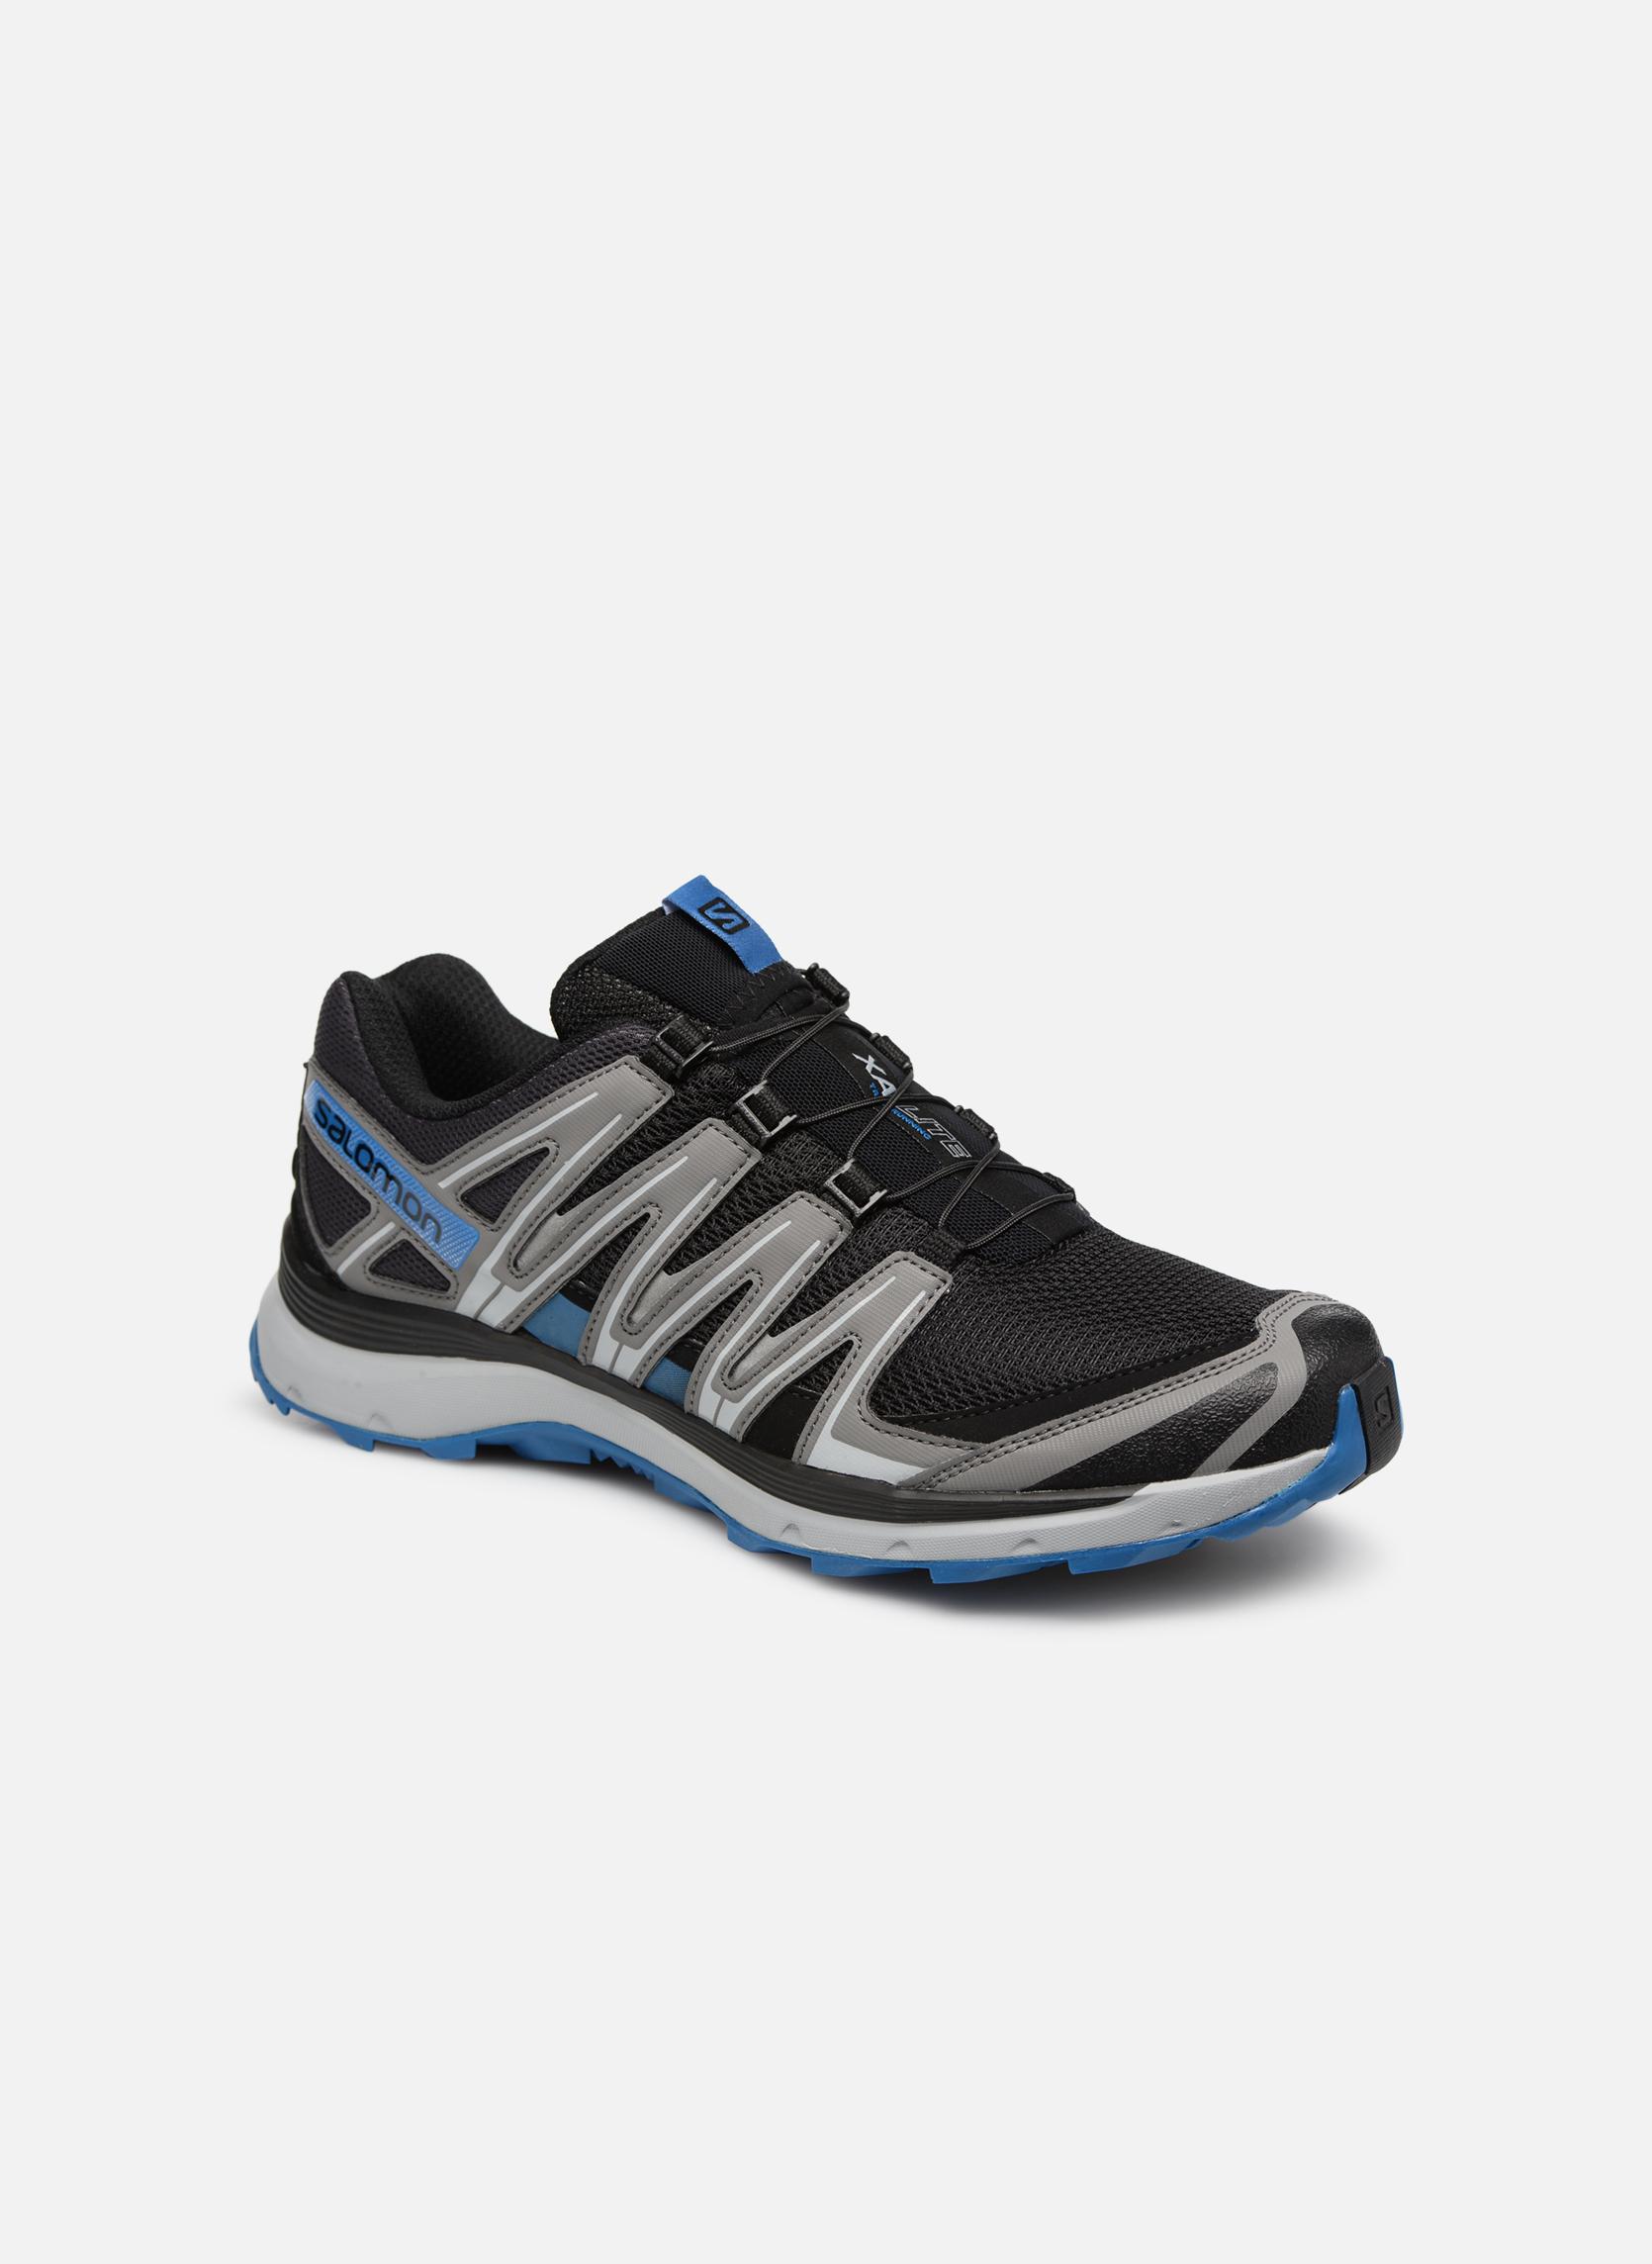 Zapatillas de deporte Hombre Xa Lite